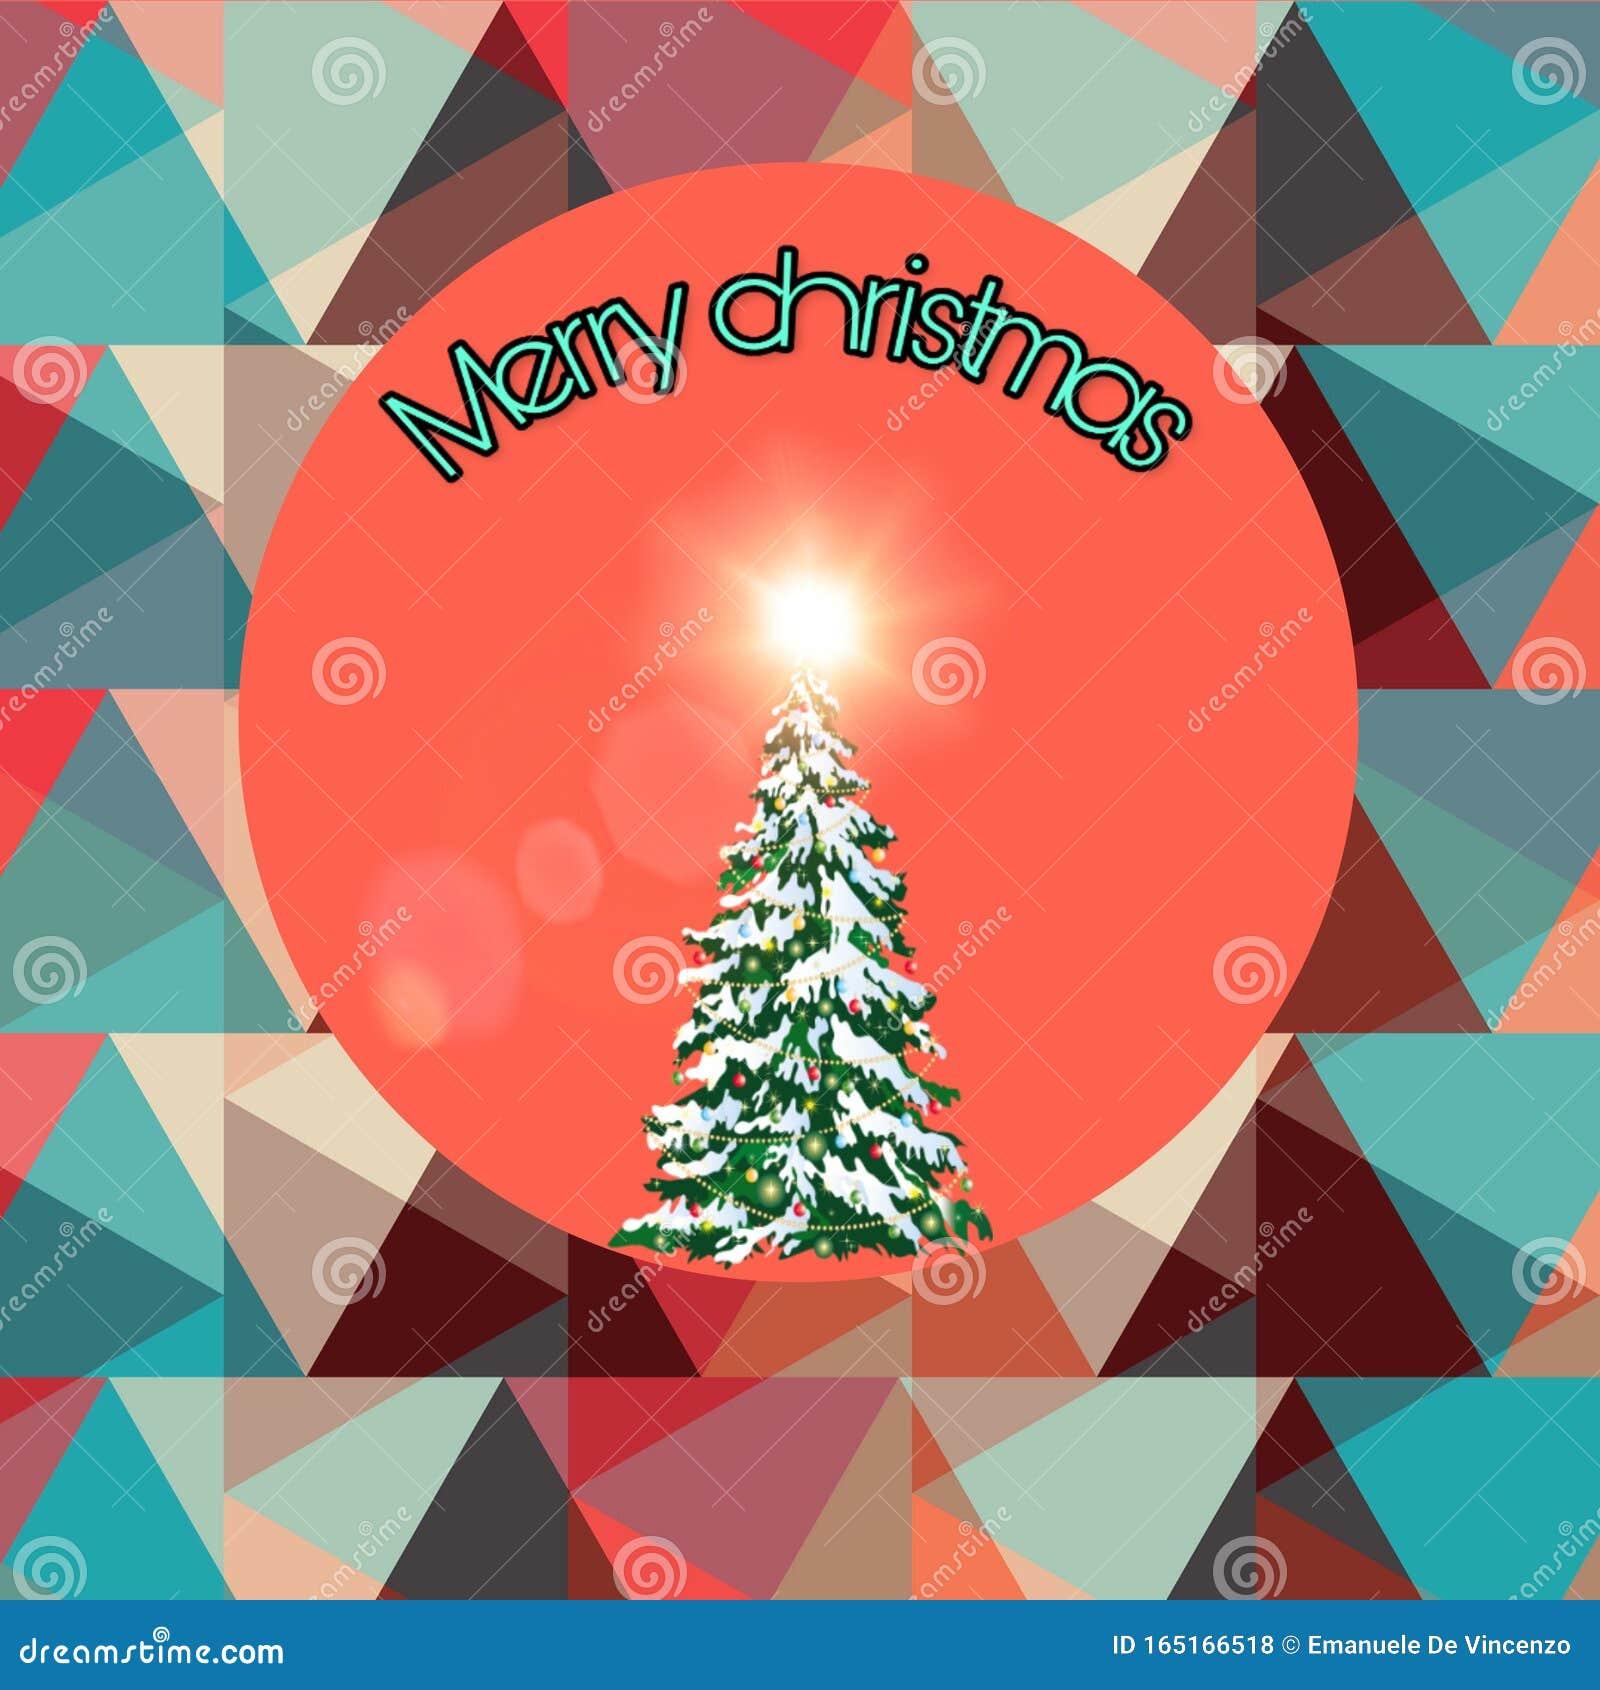 Vintage Colors Christmas Postcard Stock Photo Image Of Merrychristmas Vintage 165166518